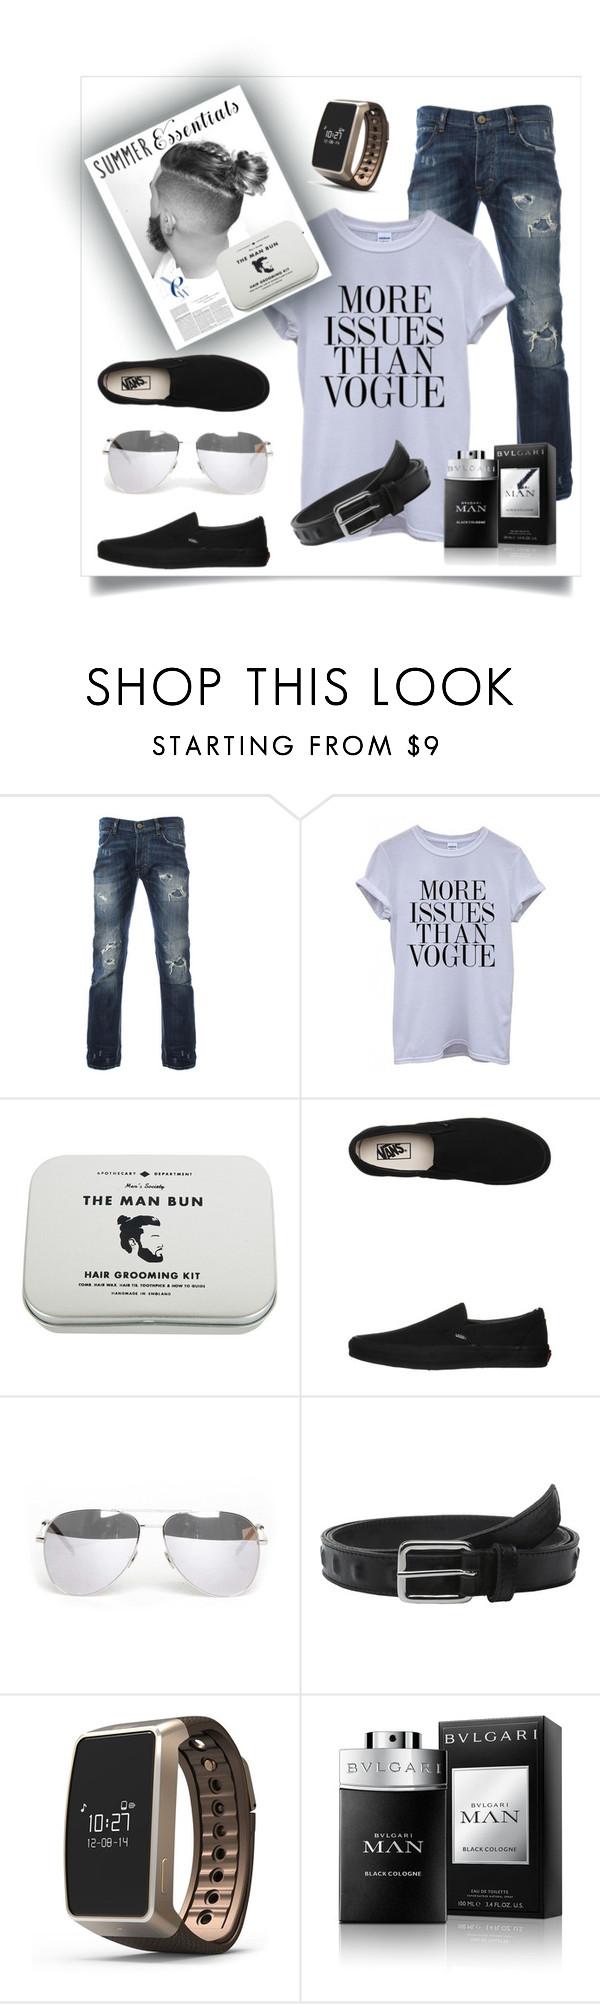 """Untitled #192"" by jaima ❤ liked on Polyvore featuring Men's Society, Vans, Yves Saint Laurent, The Kooples, MyKronoz, BCBGMAXAZRIA, Bulgari, men's fashion, menswear and summermenswearessentials"